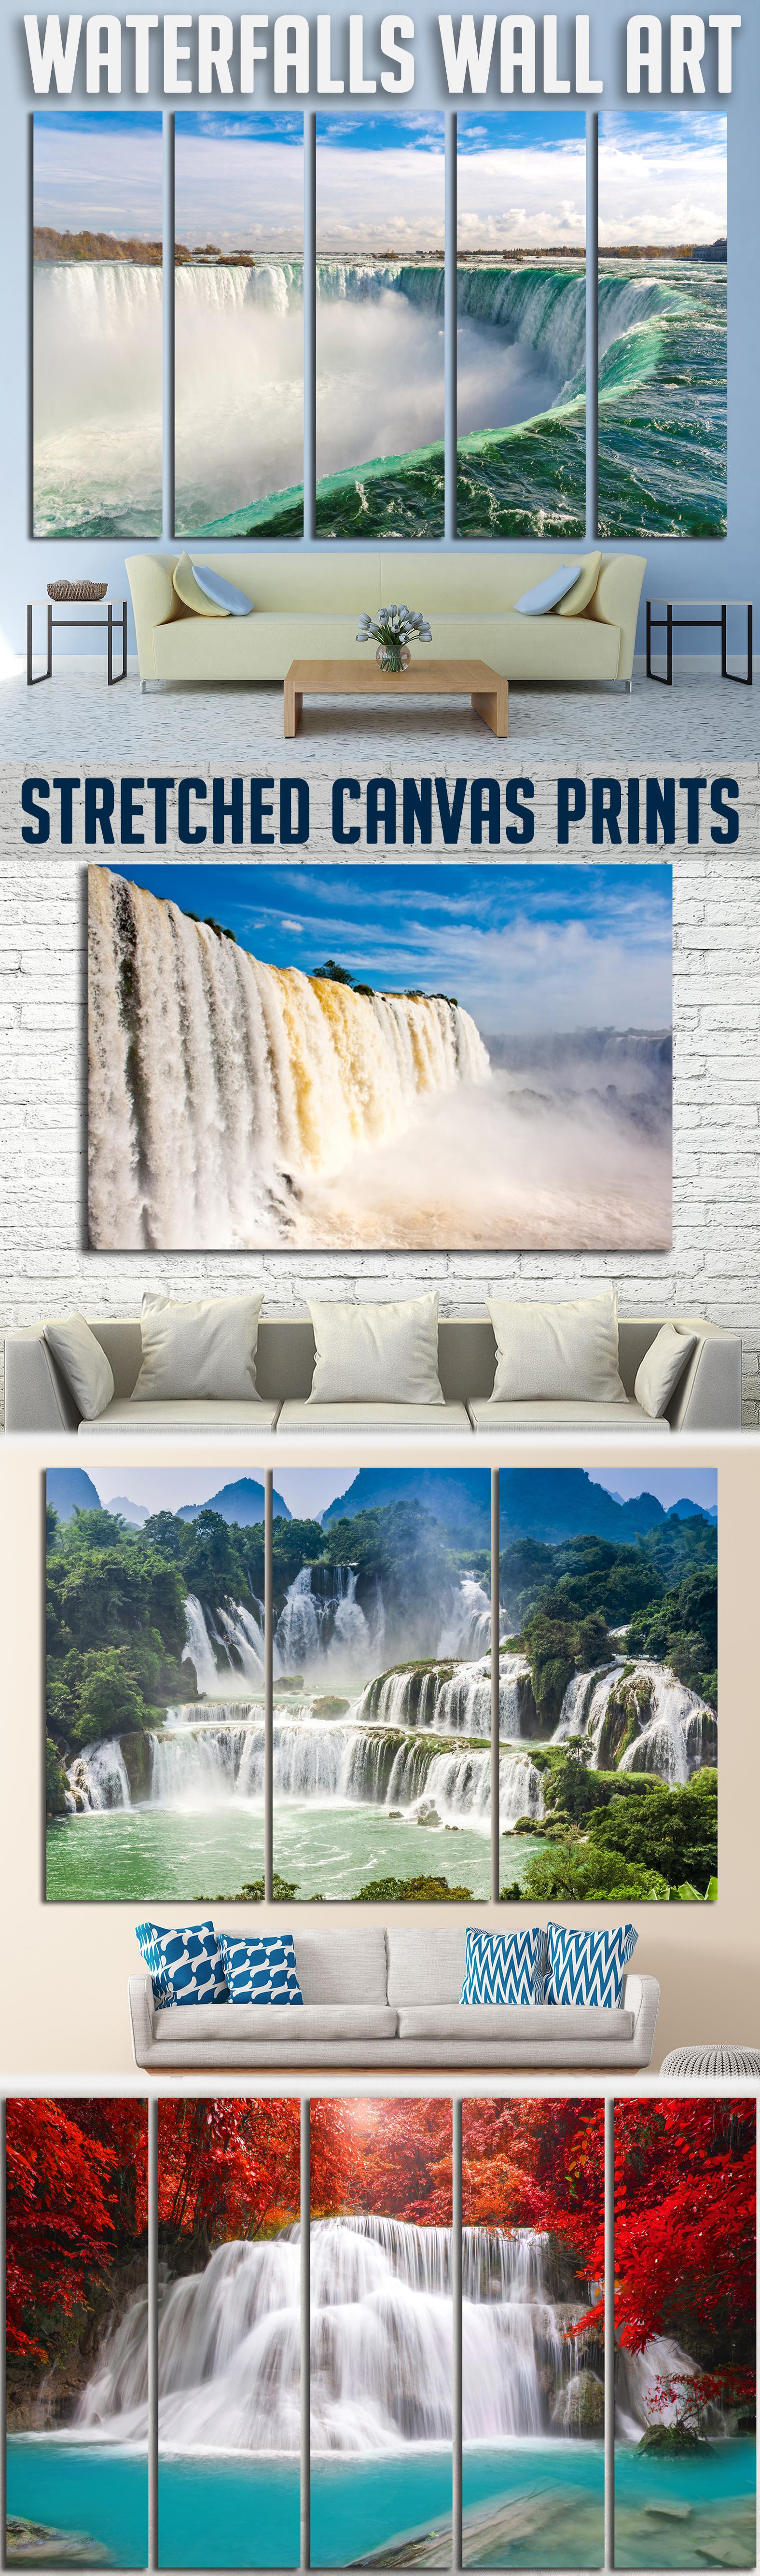 Waterfall wall arts canvas print for home decor waterfalls wall